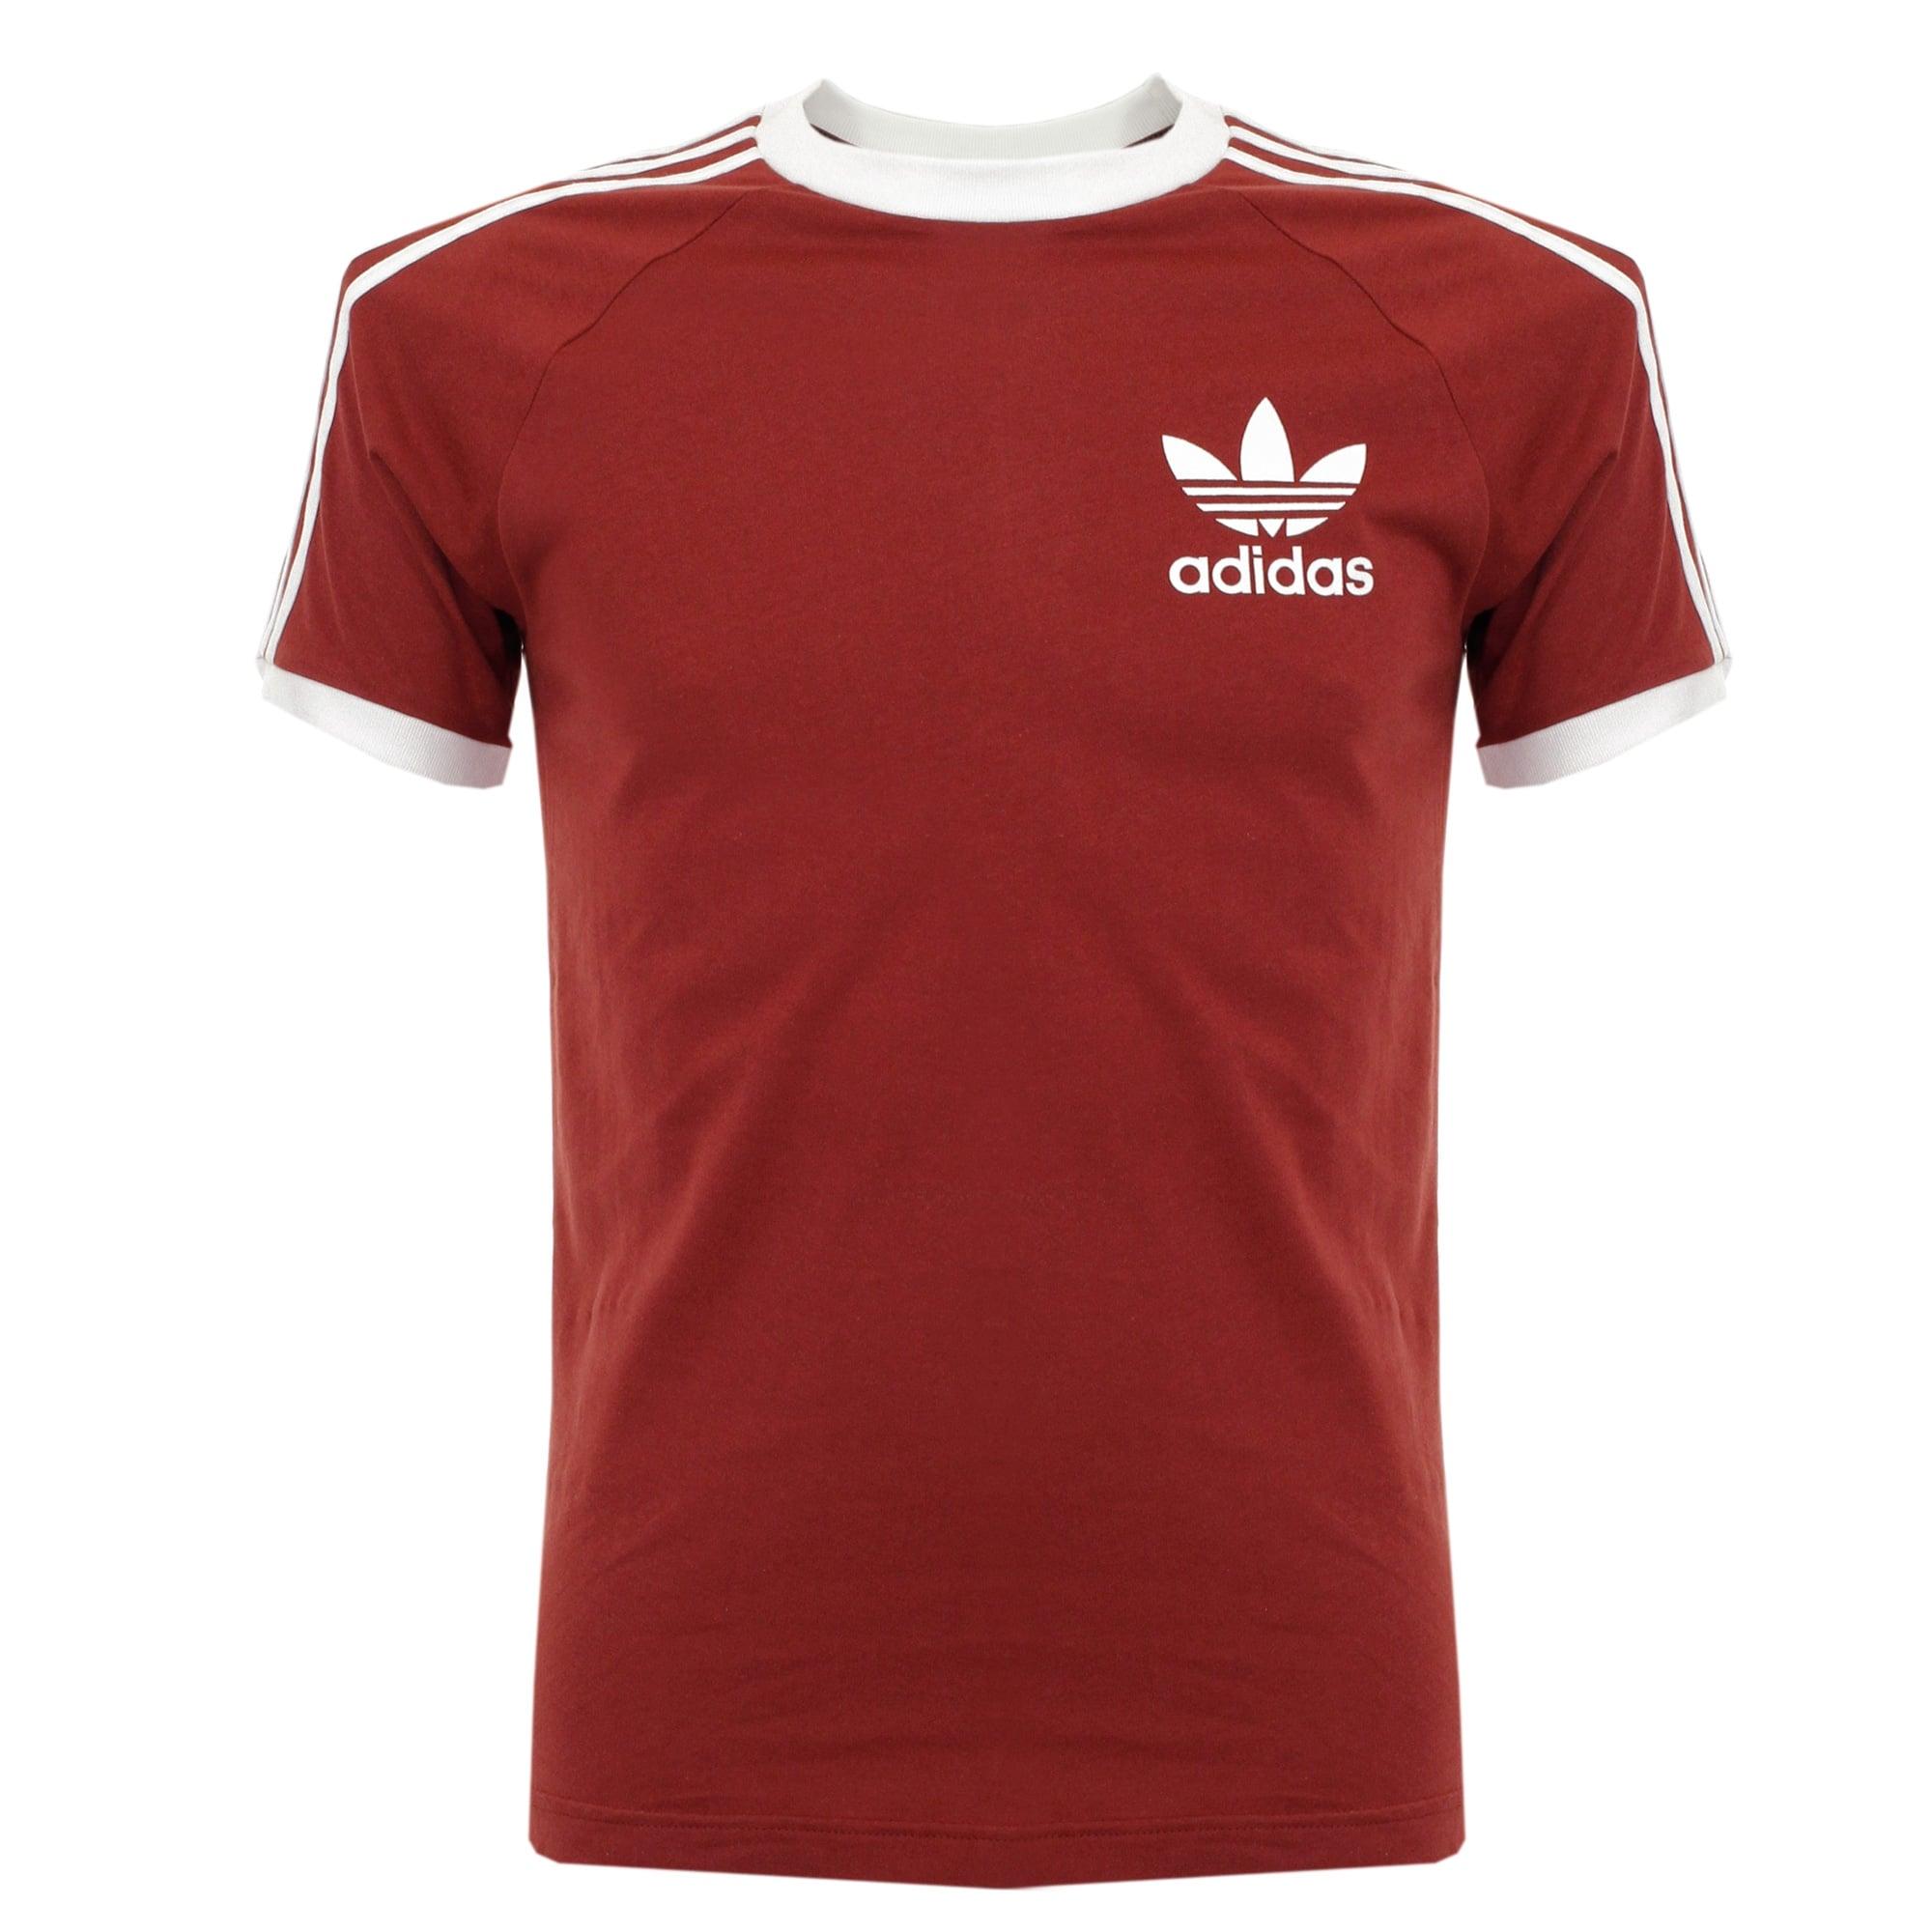 Buy adidas classic t shirt adidas barricade saksaywaman for Adidas classic t shirt